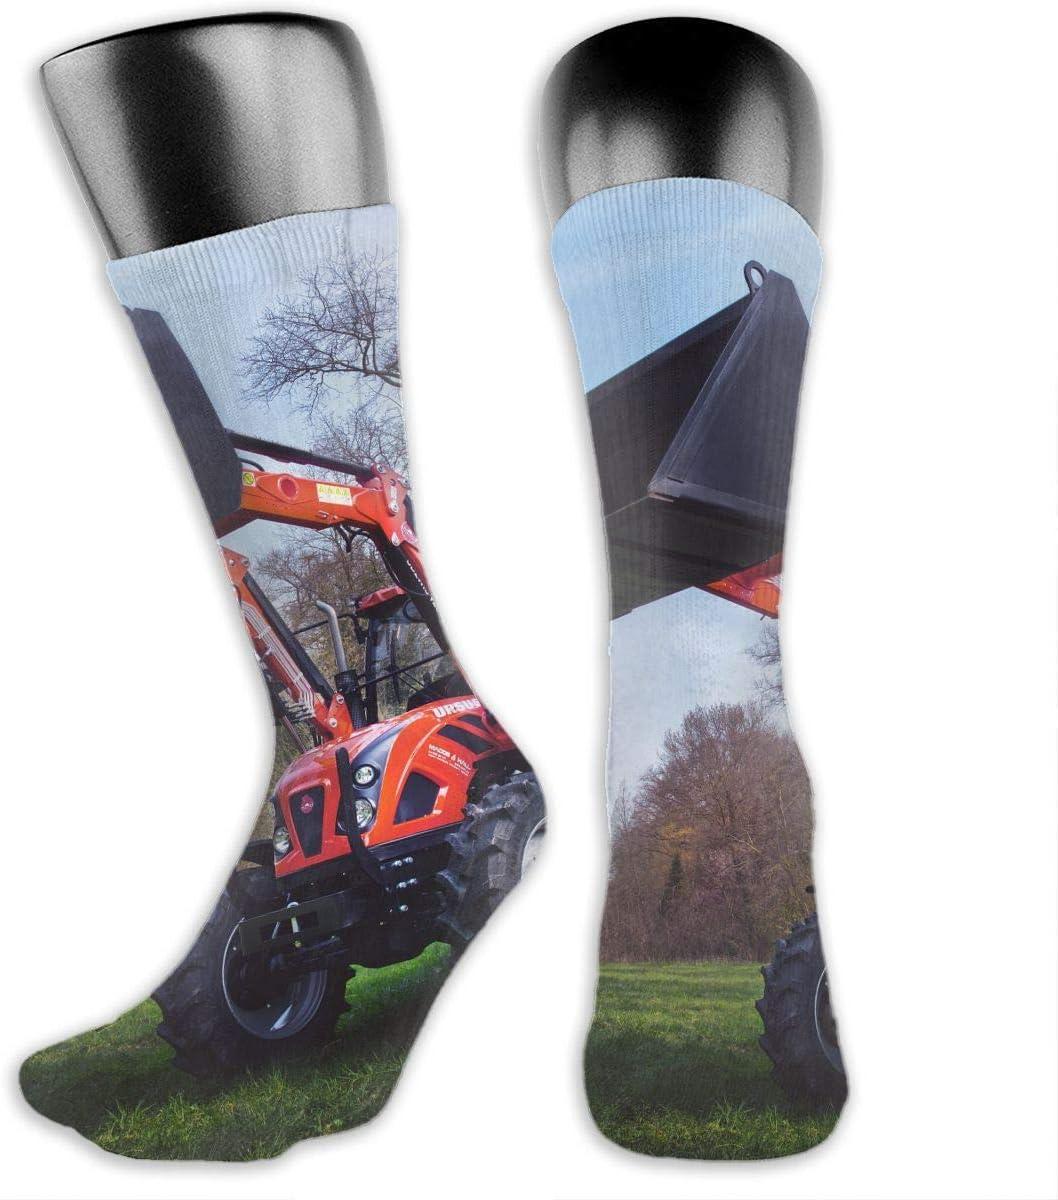 OLGCZM Tractor Farm Machine Men Womens Thin High Ankle Casual Socks Fit Outdoor Hiking Trail